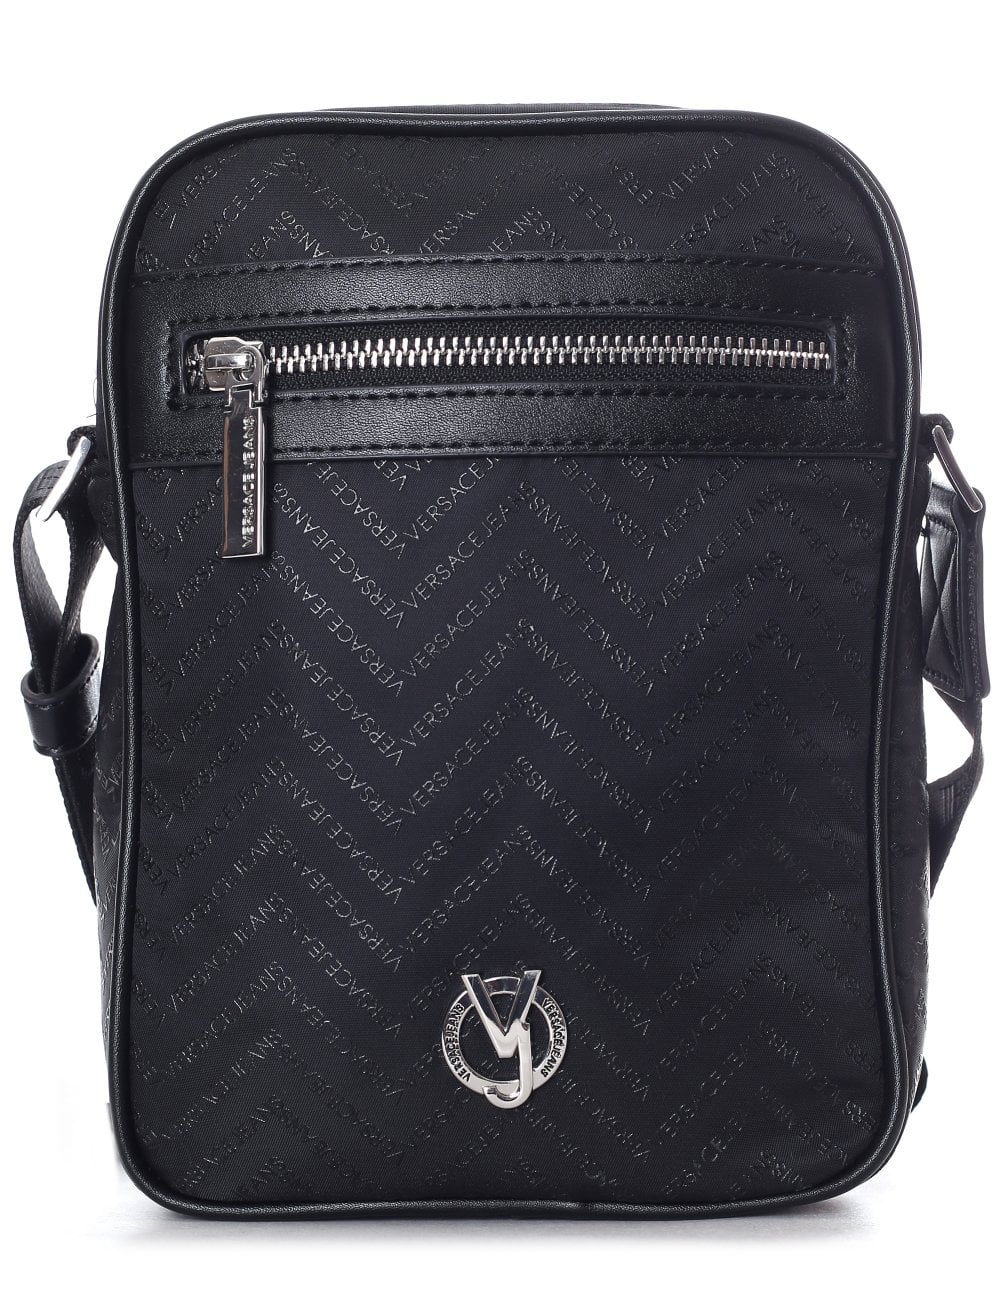 Versace Jeans Men s Chevron Cross Body Bag b5845a5e6a6a9